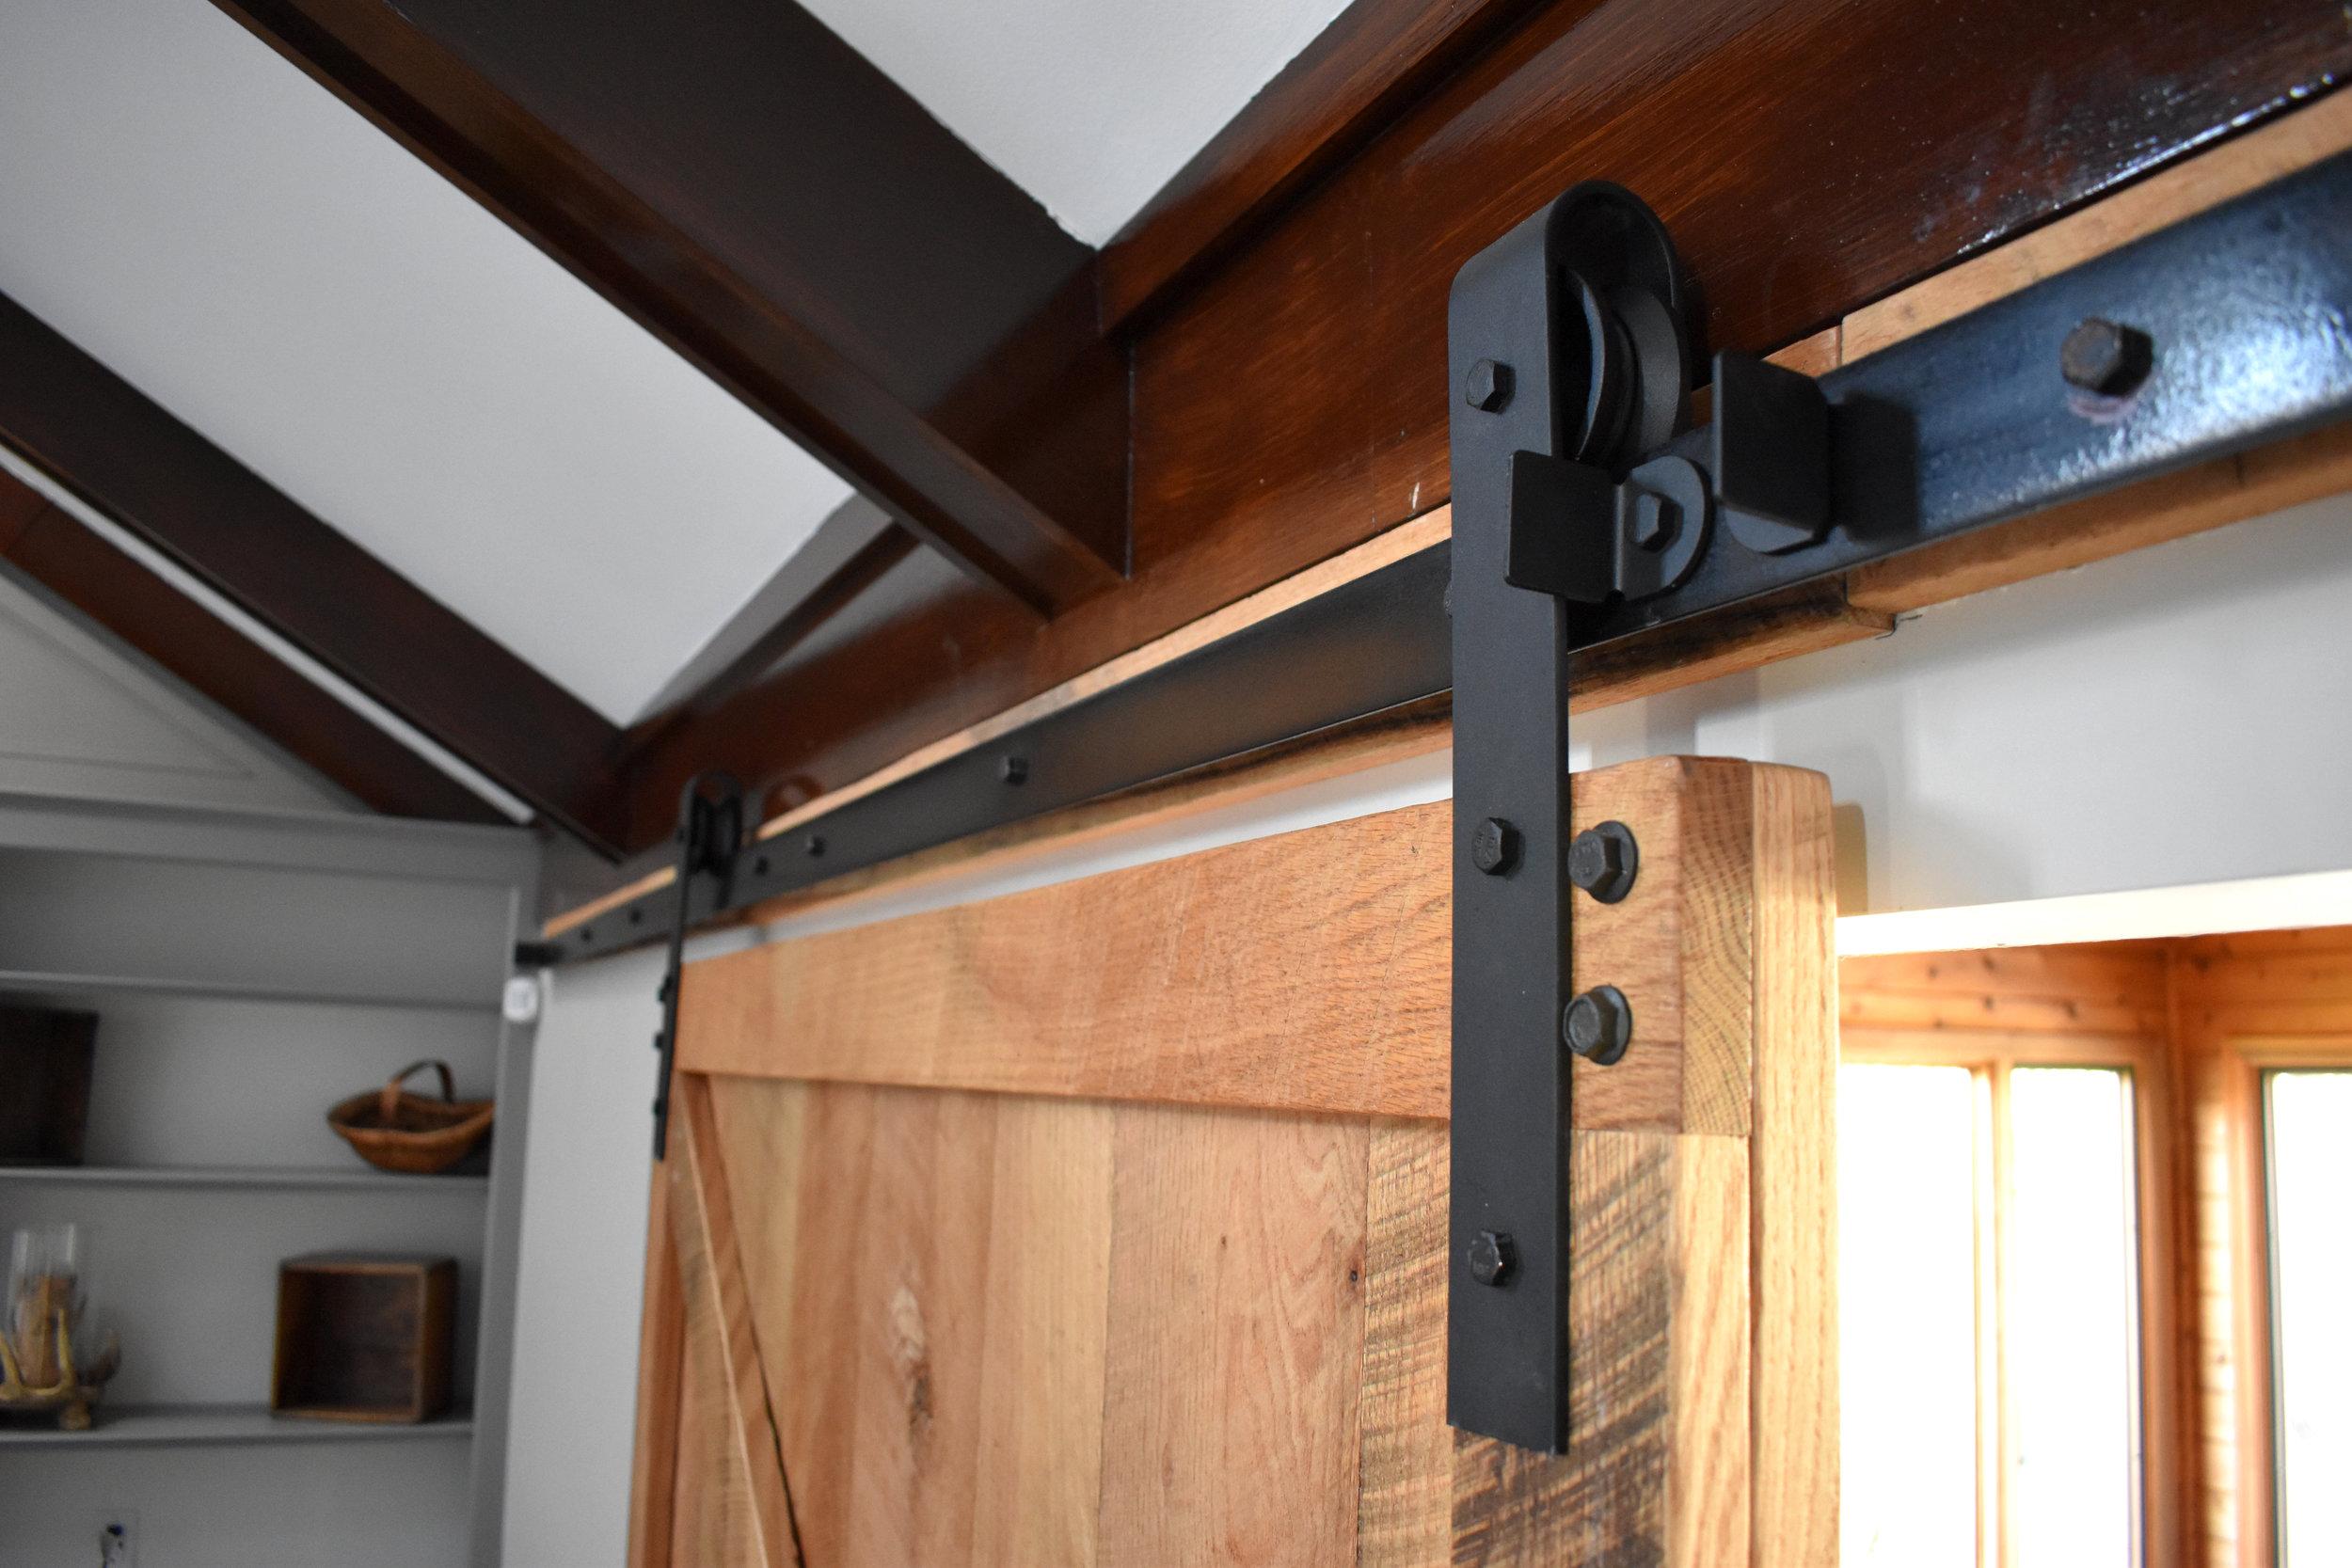 attachment barn barns after lumber slider frank door